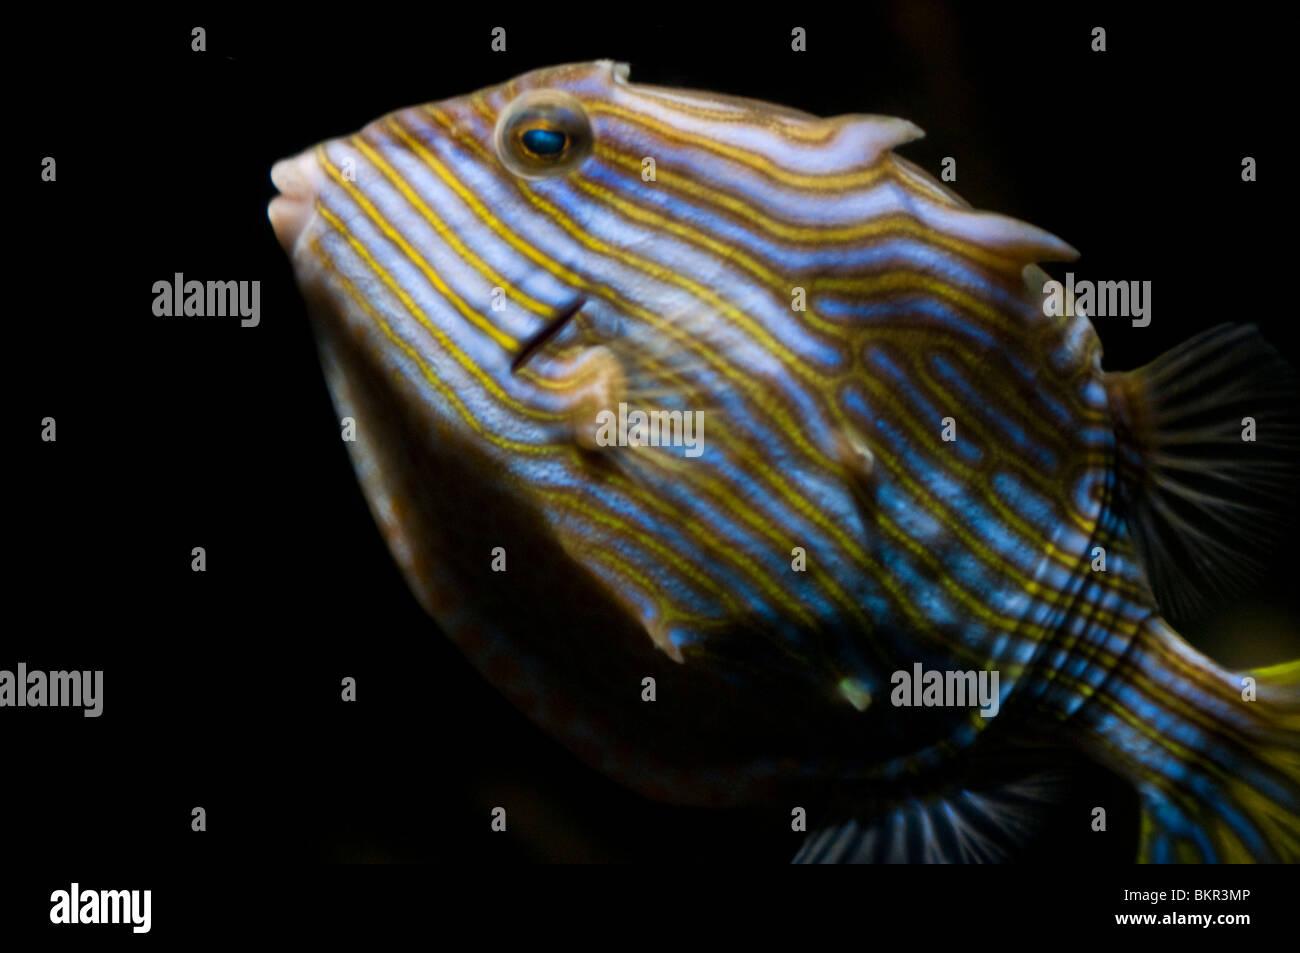 Female Shaw's cowfish, Aracana aurita, Sydney Aquarium, Sydney, Australia - Stock Image